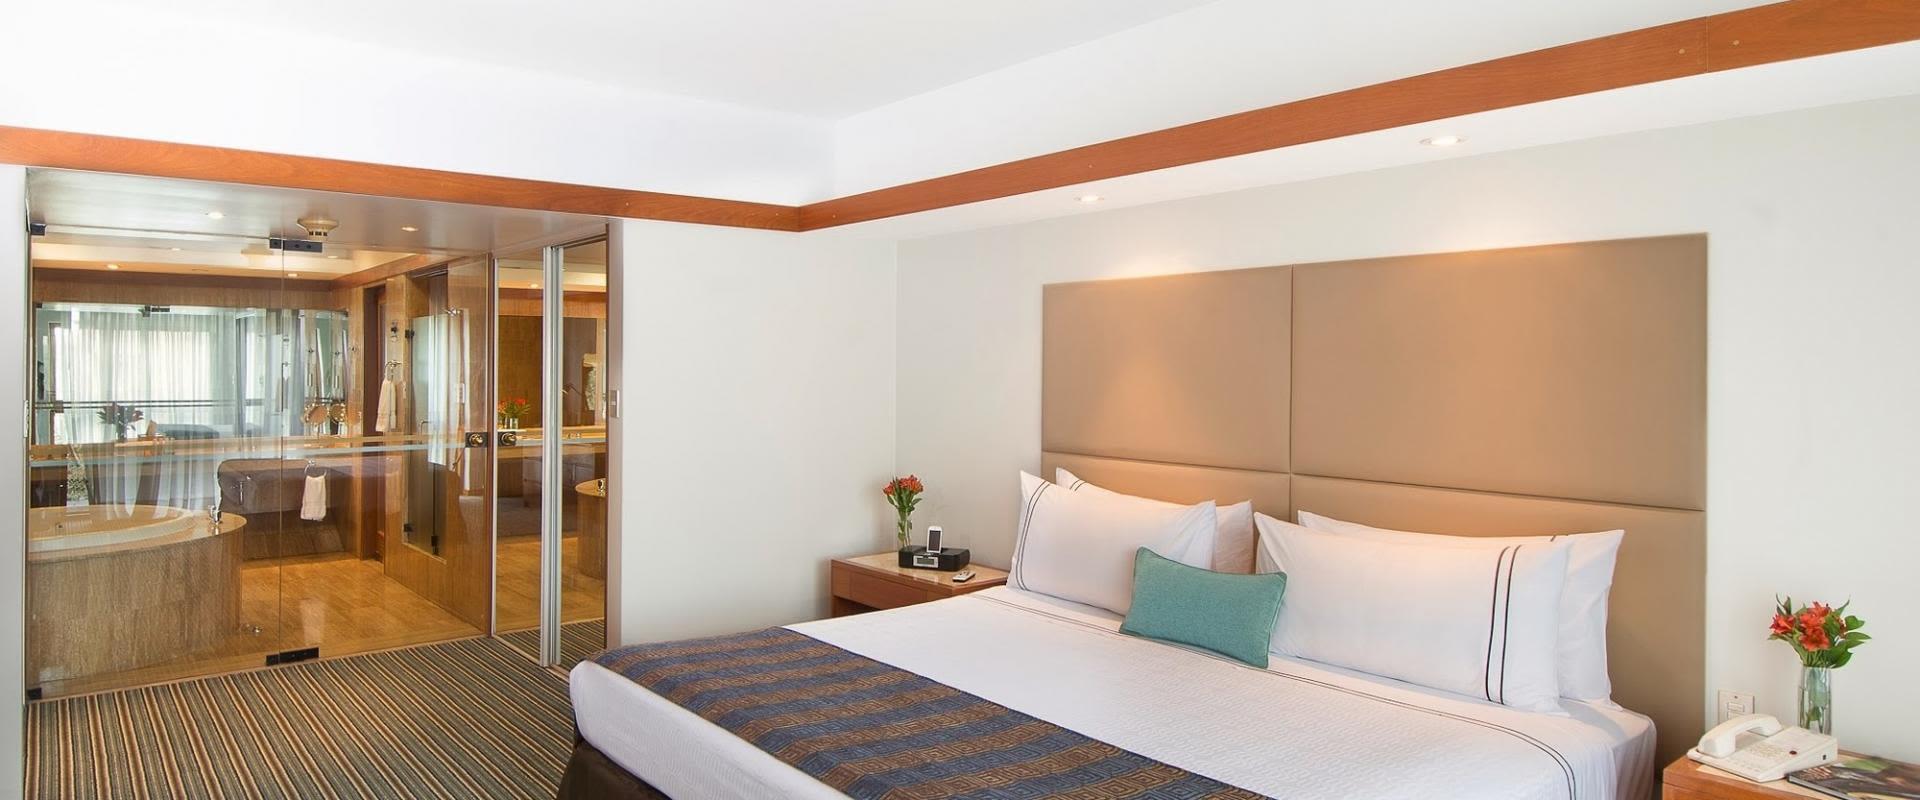 Sonesta Hotel El Olivar Lima Suites